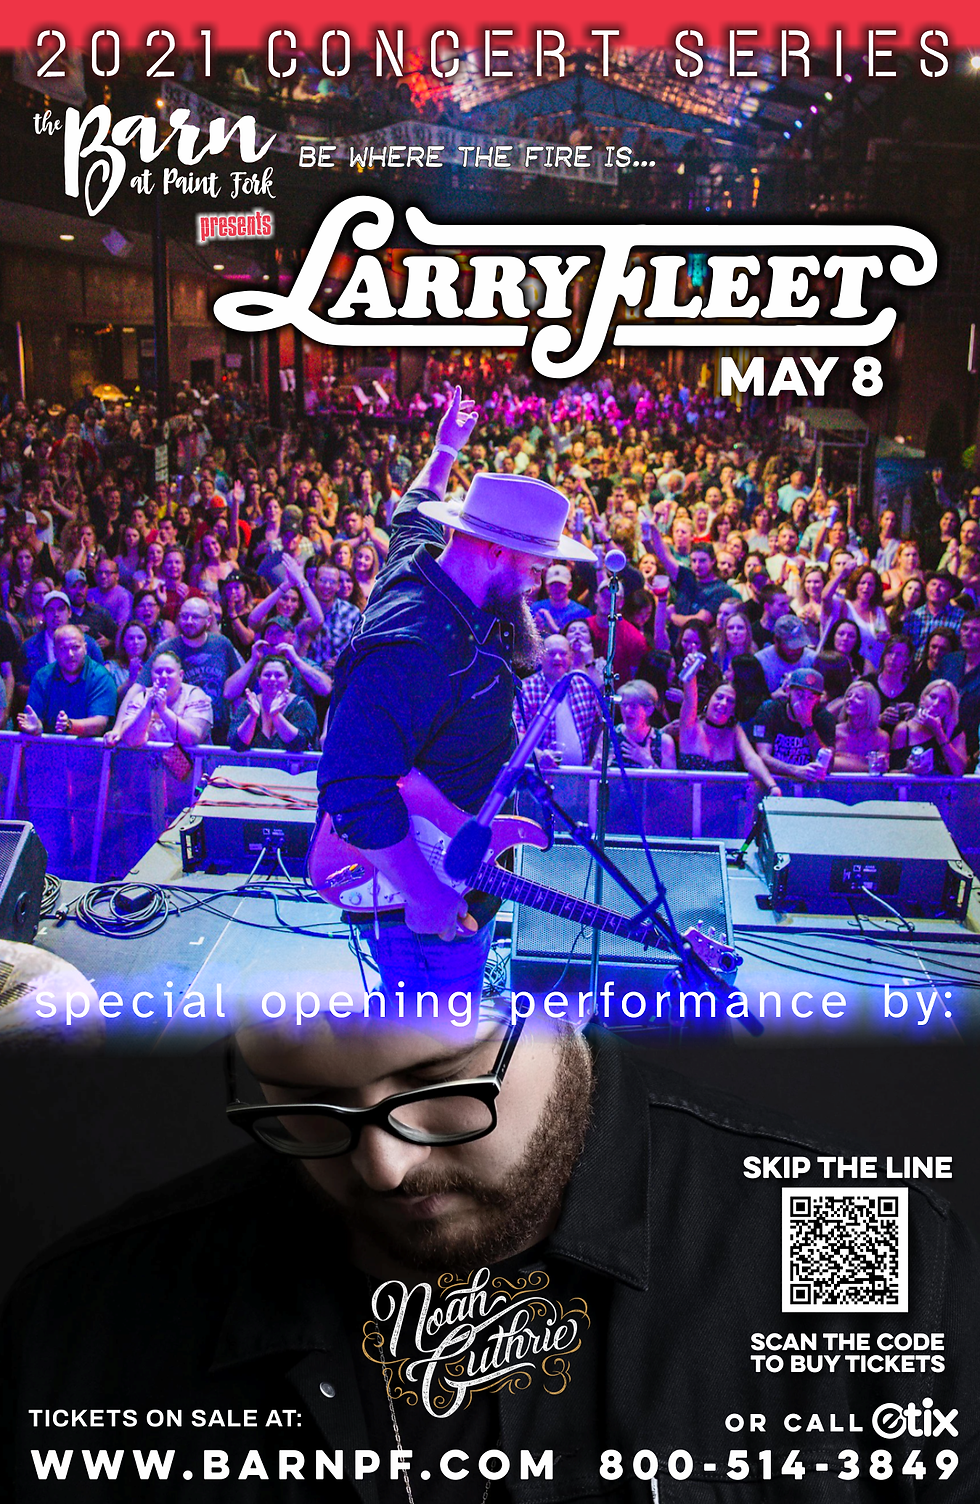 2021-04-04-Larry-Fleet-Poster-002.png